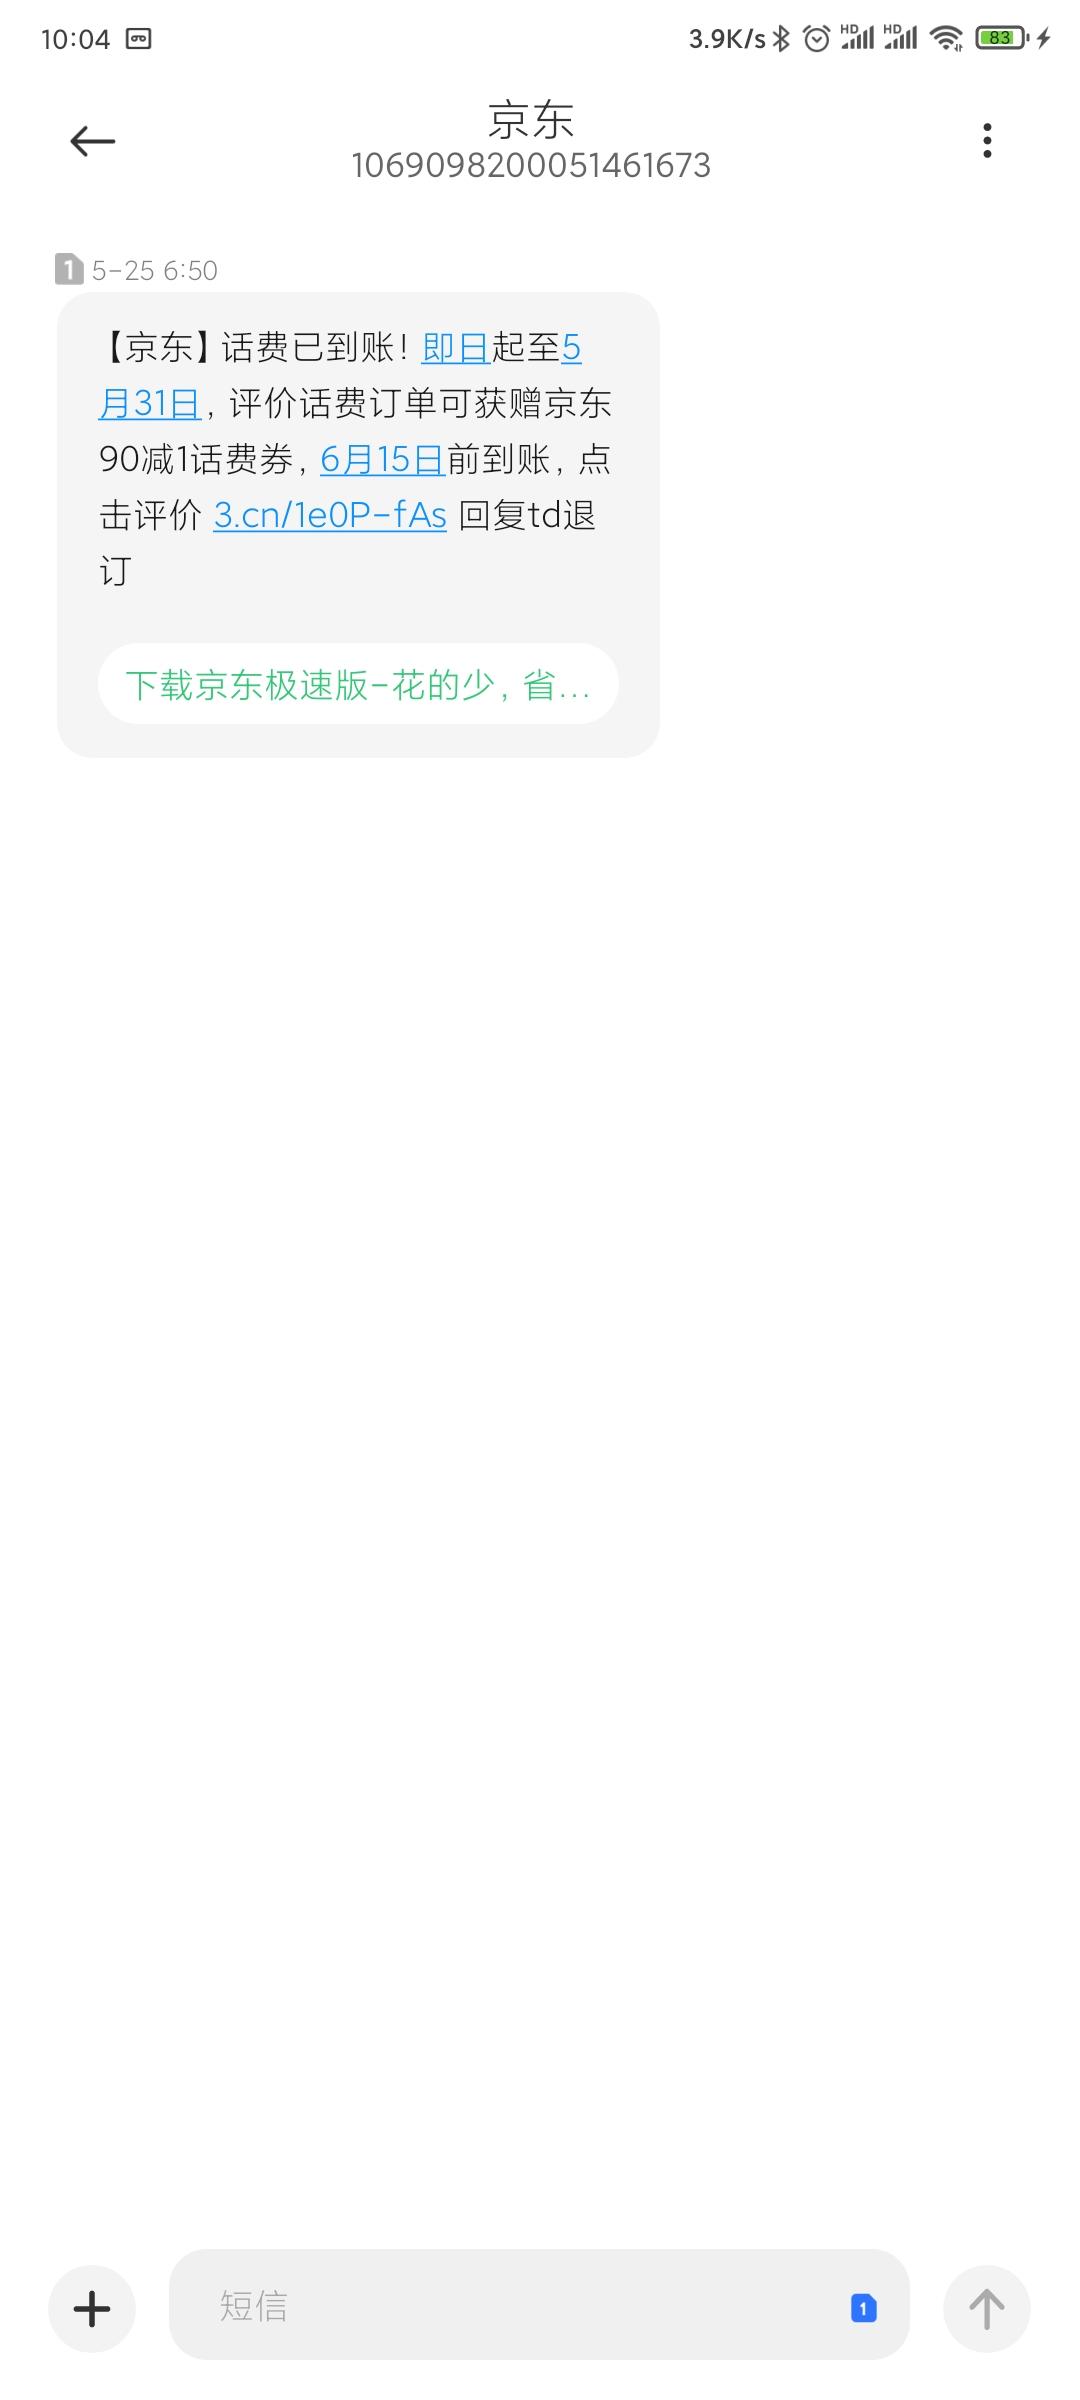 Screenshot_2021-05-26-10-04-50-159_com.android.mms.jpg